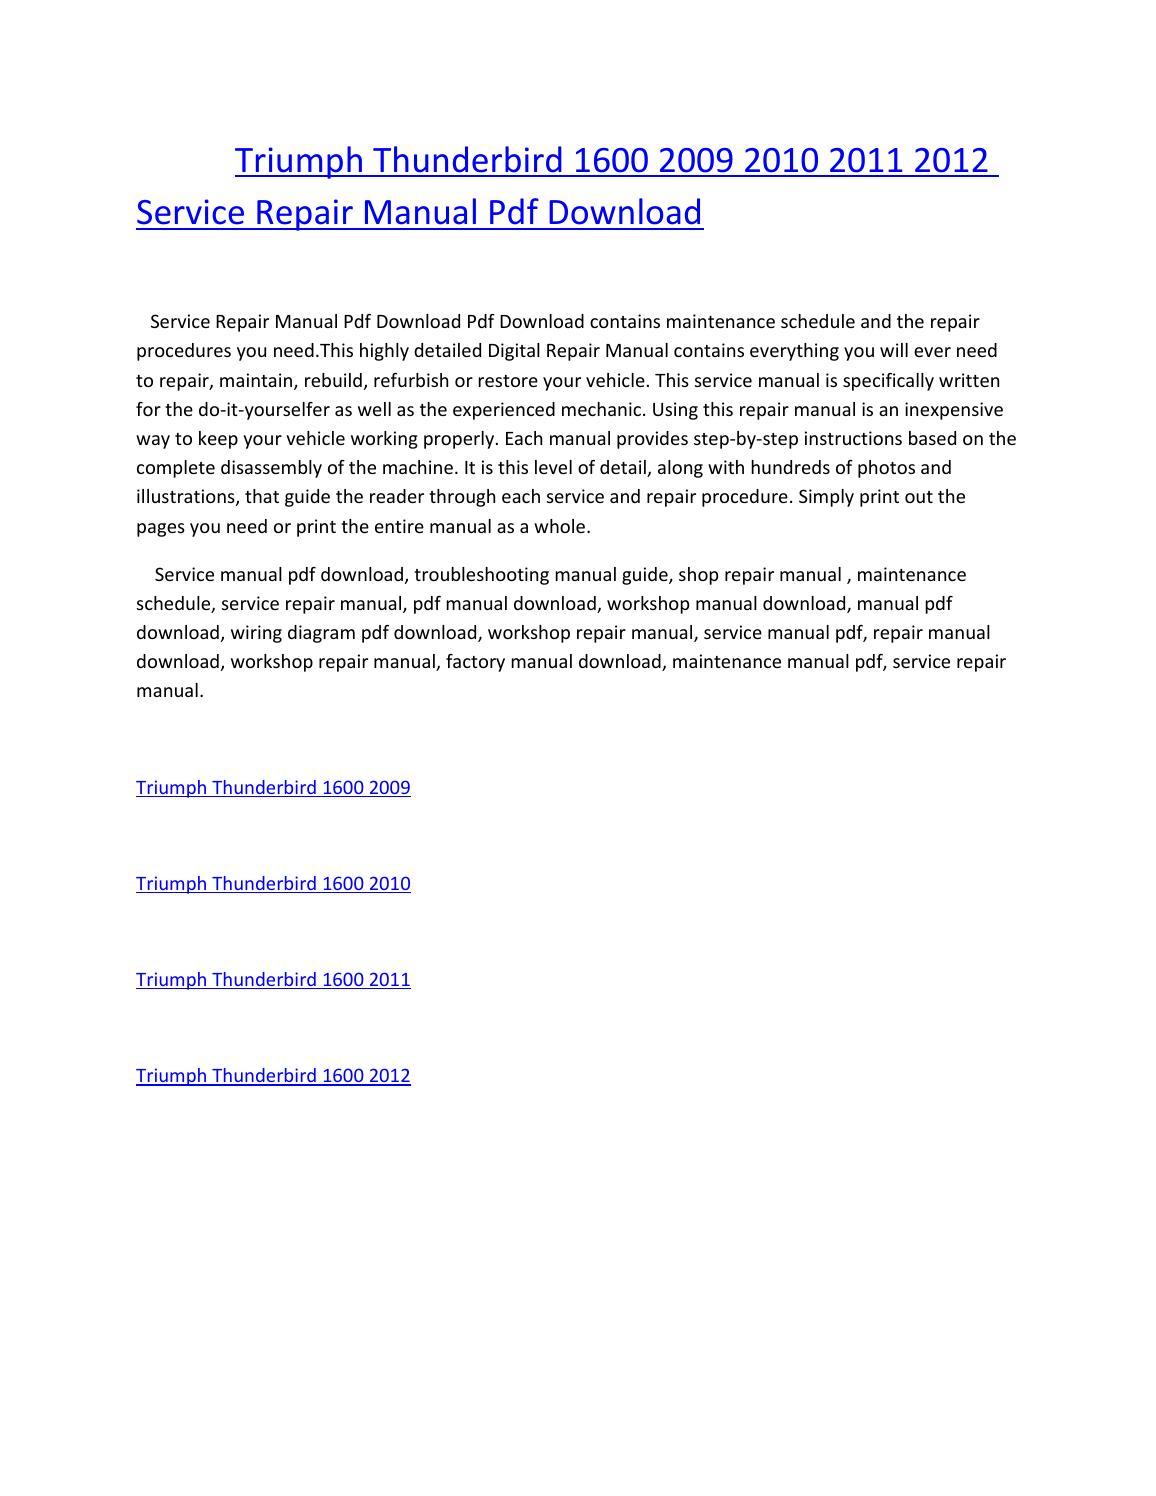 Triumph thunderbird 1600 2009 2010 2011 2012 service repair manual pdf  download by amurgului - issuu